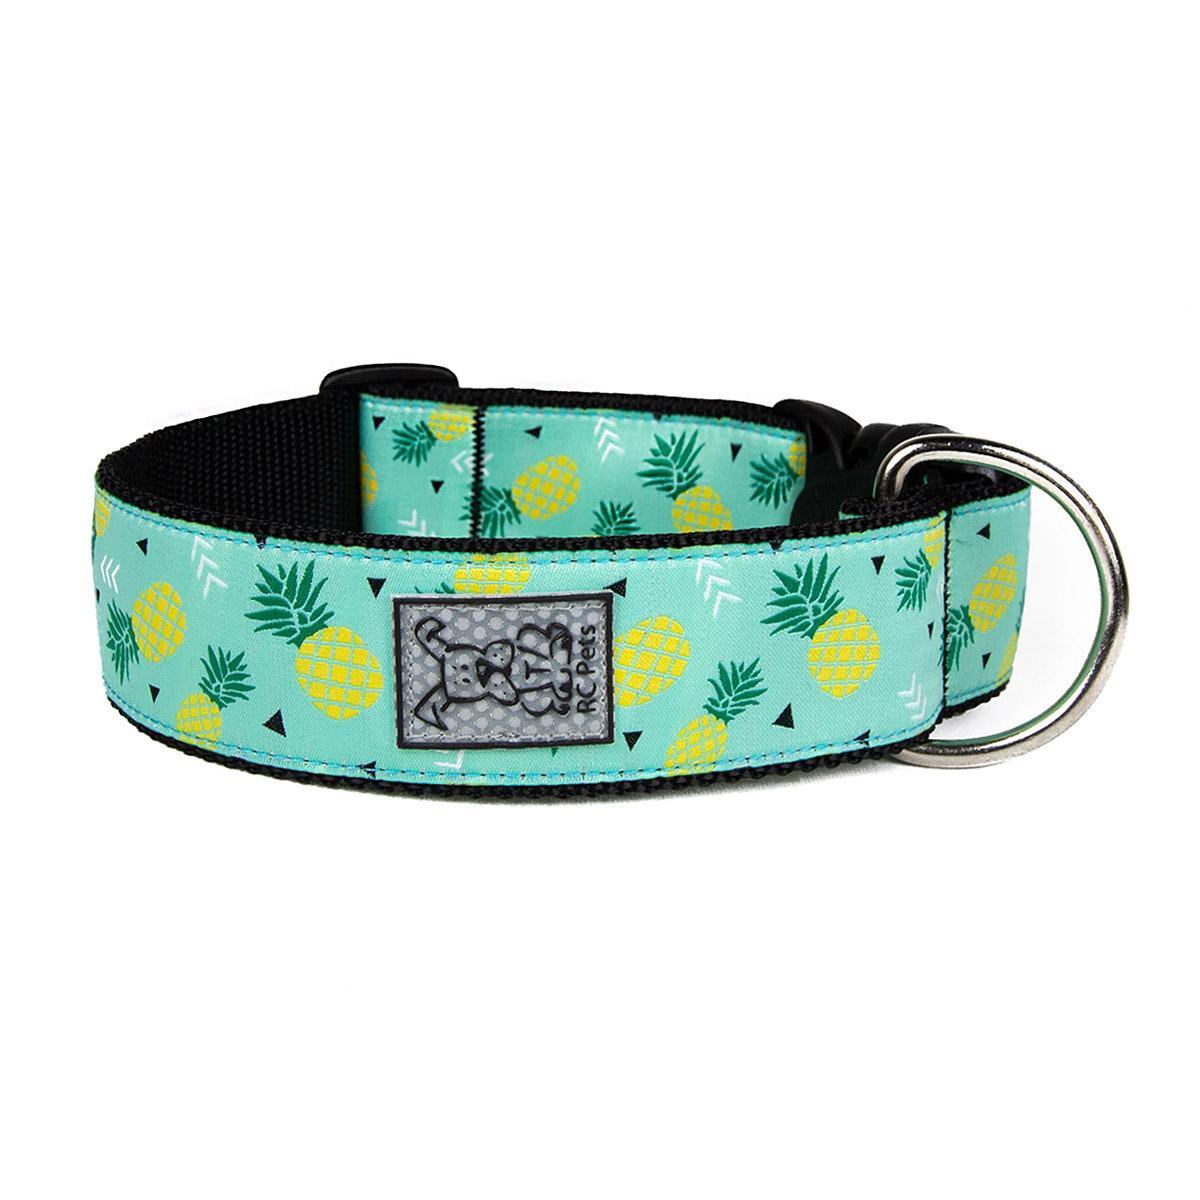 Pineapple Parade Wide Clip Adjustable Dog Collar